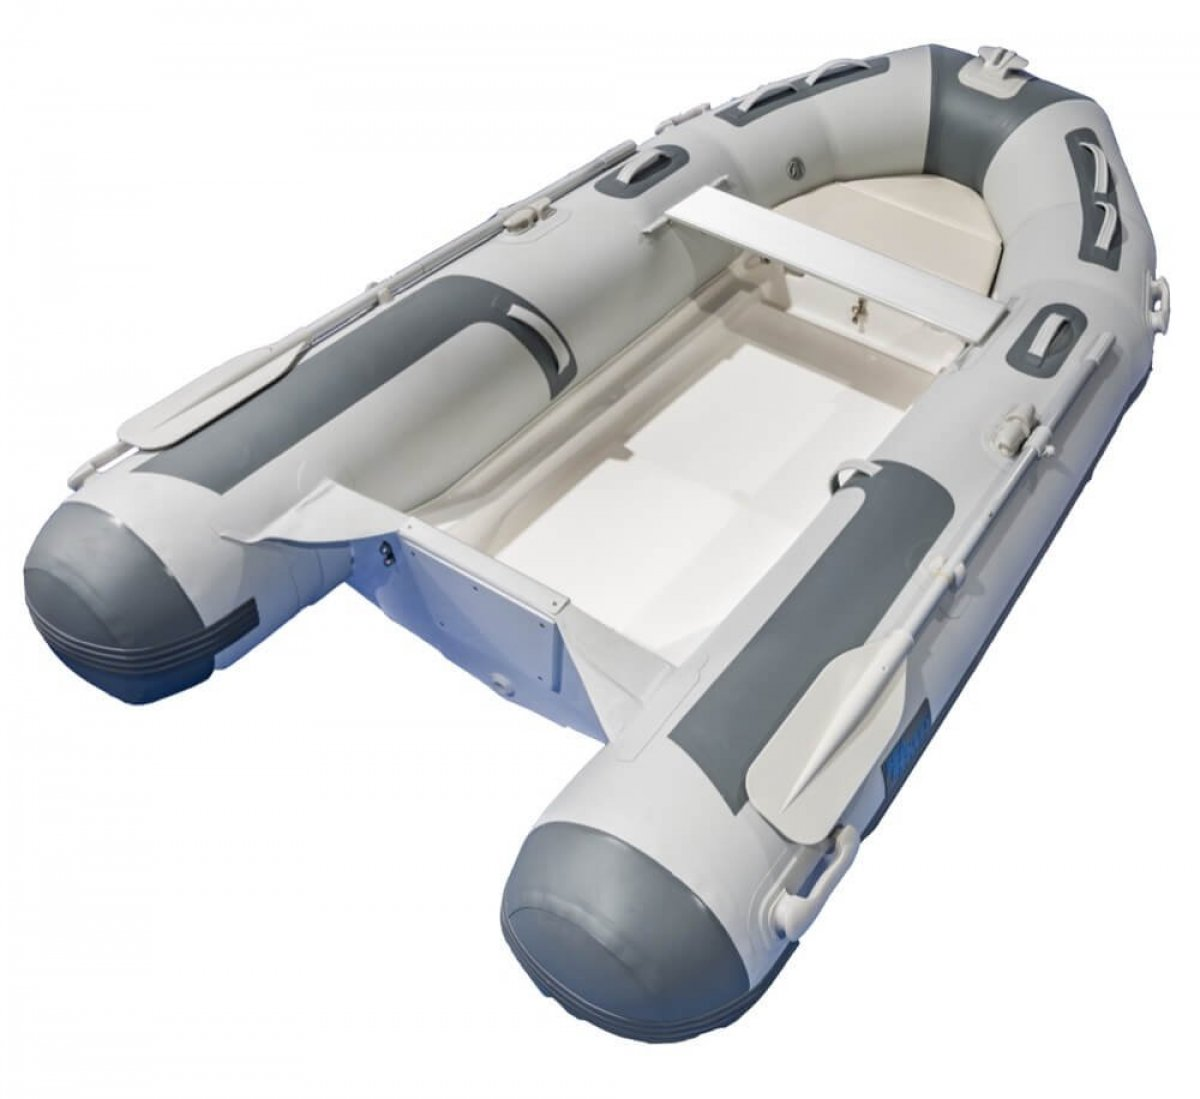 Sea Renity Marine 310B Fibreglass Double Hull Rigid Inflatable